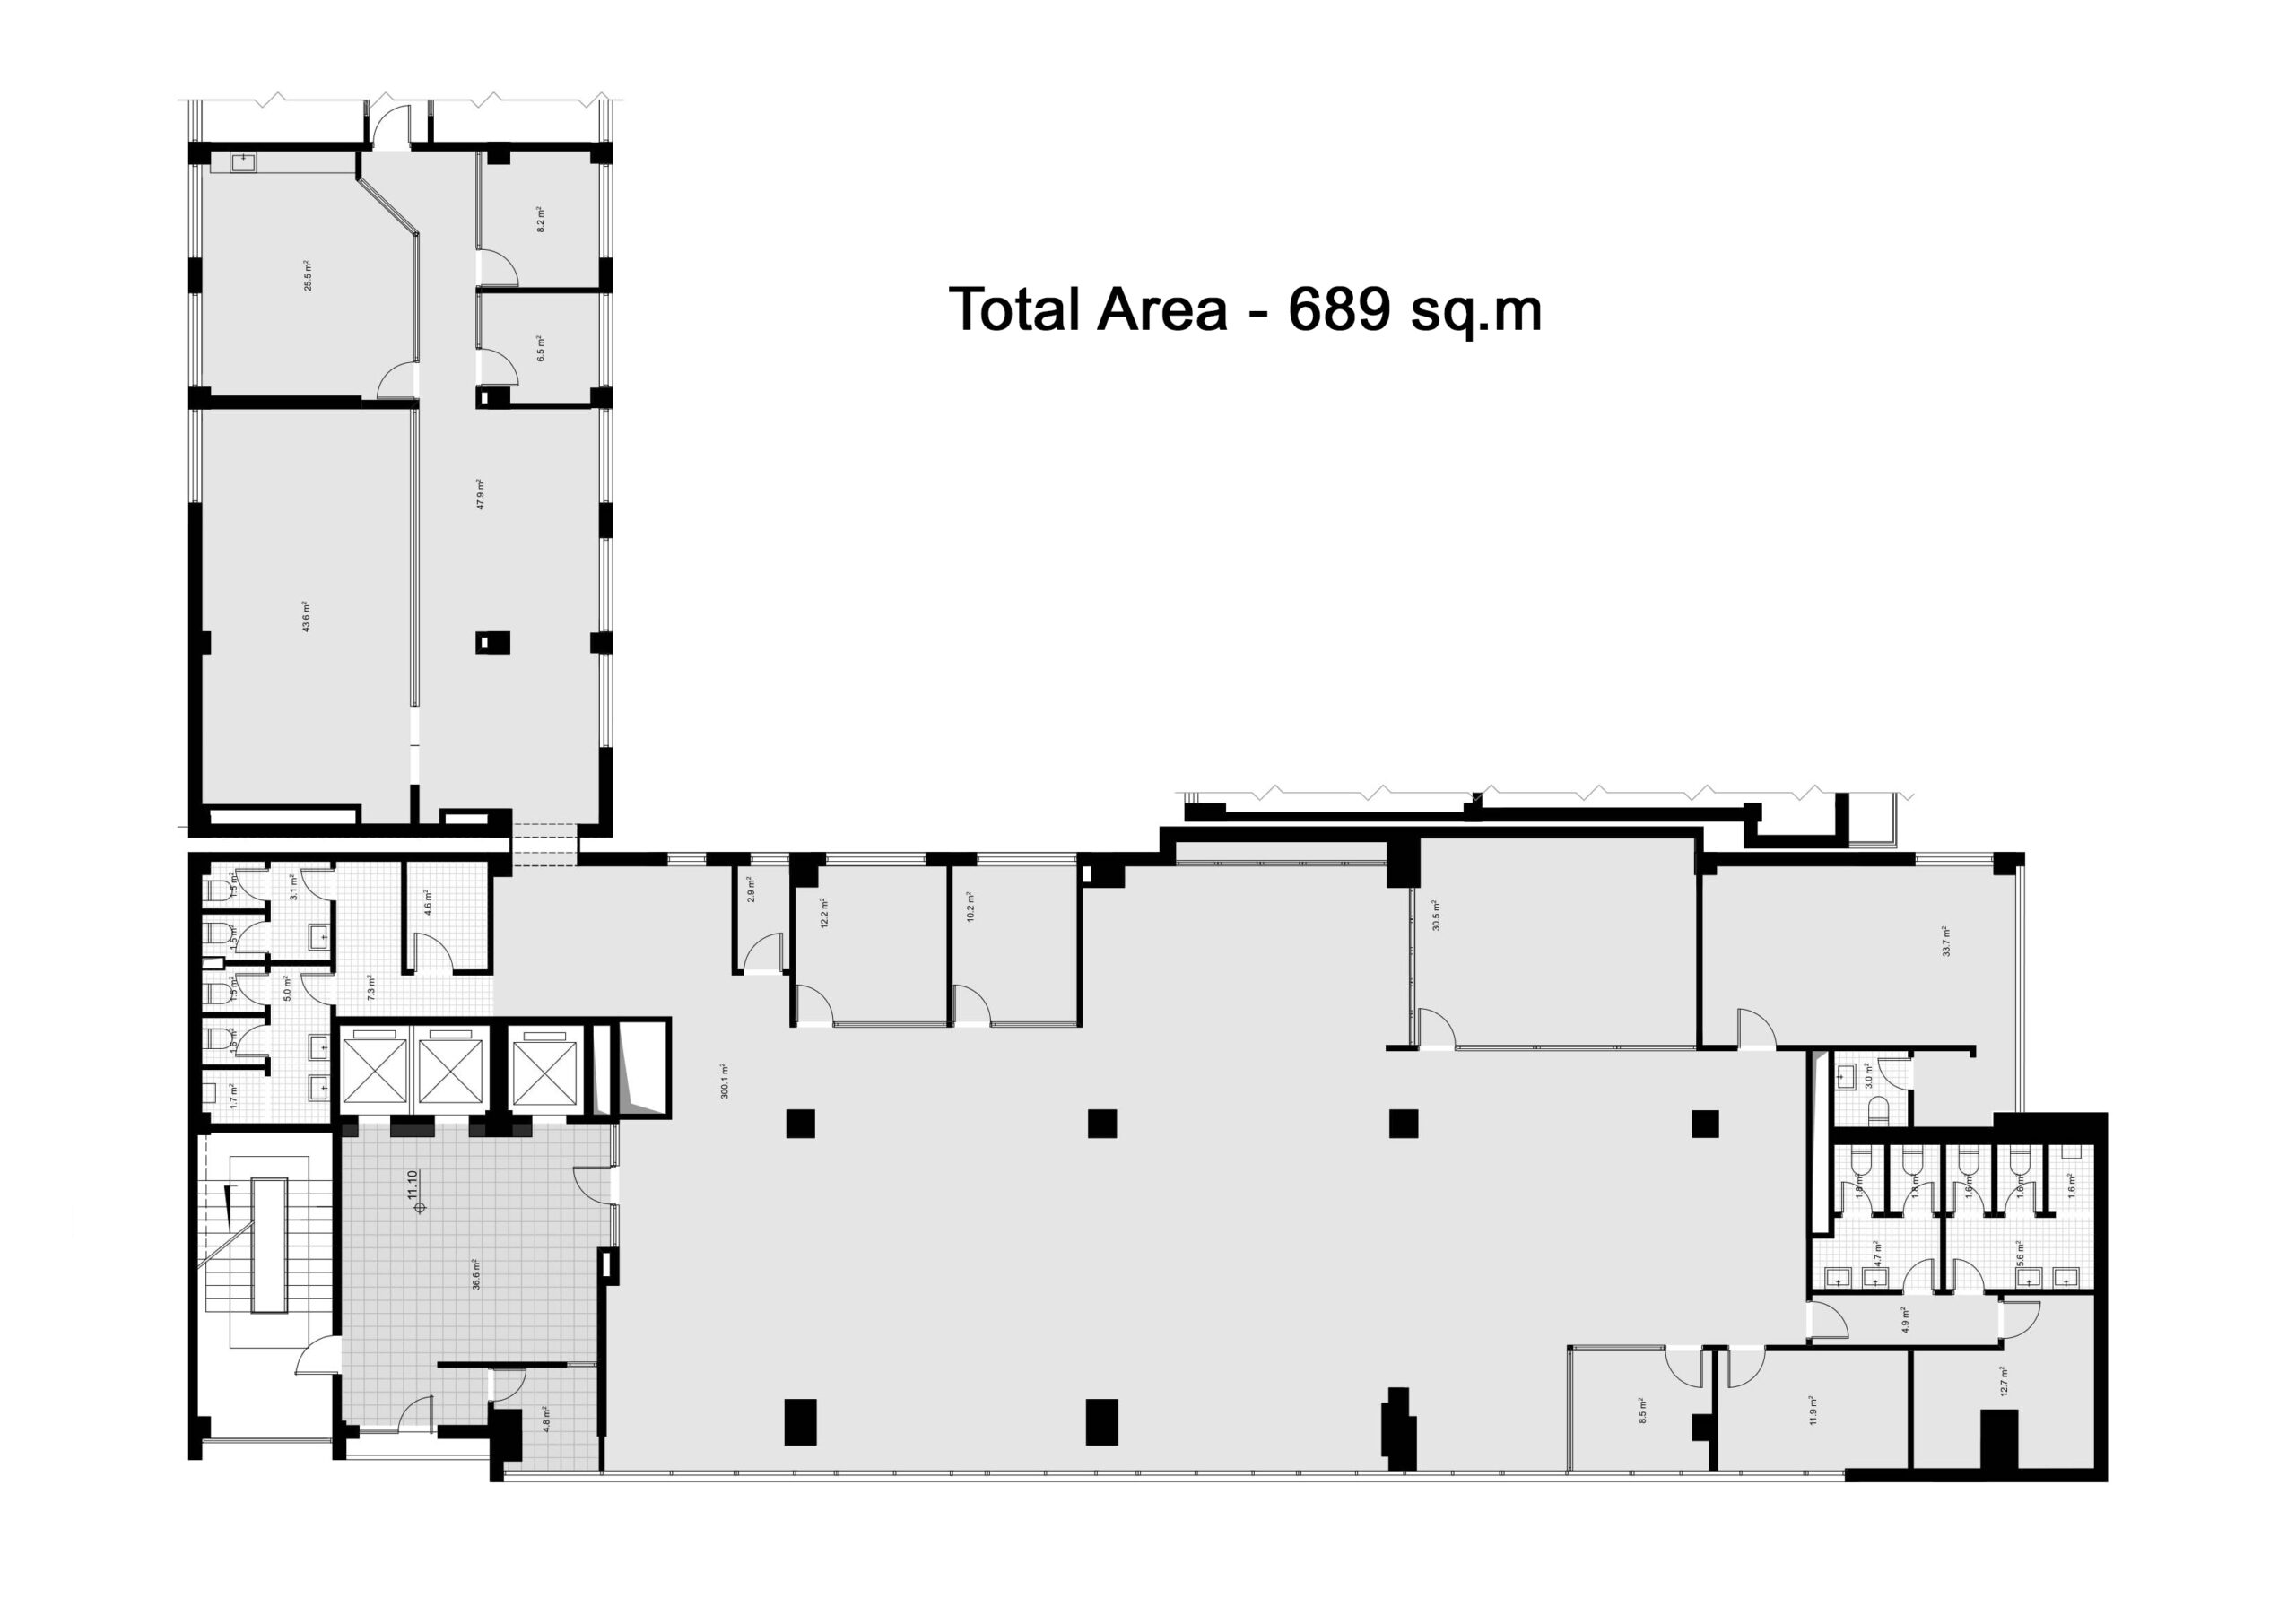 BCV presentation office space 689 sq m-13 copy